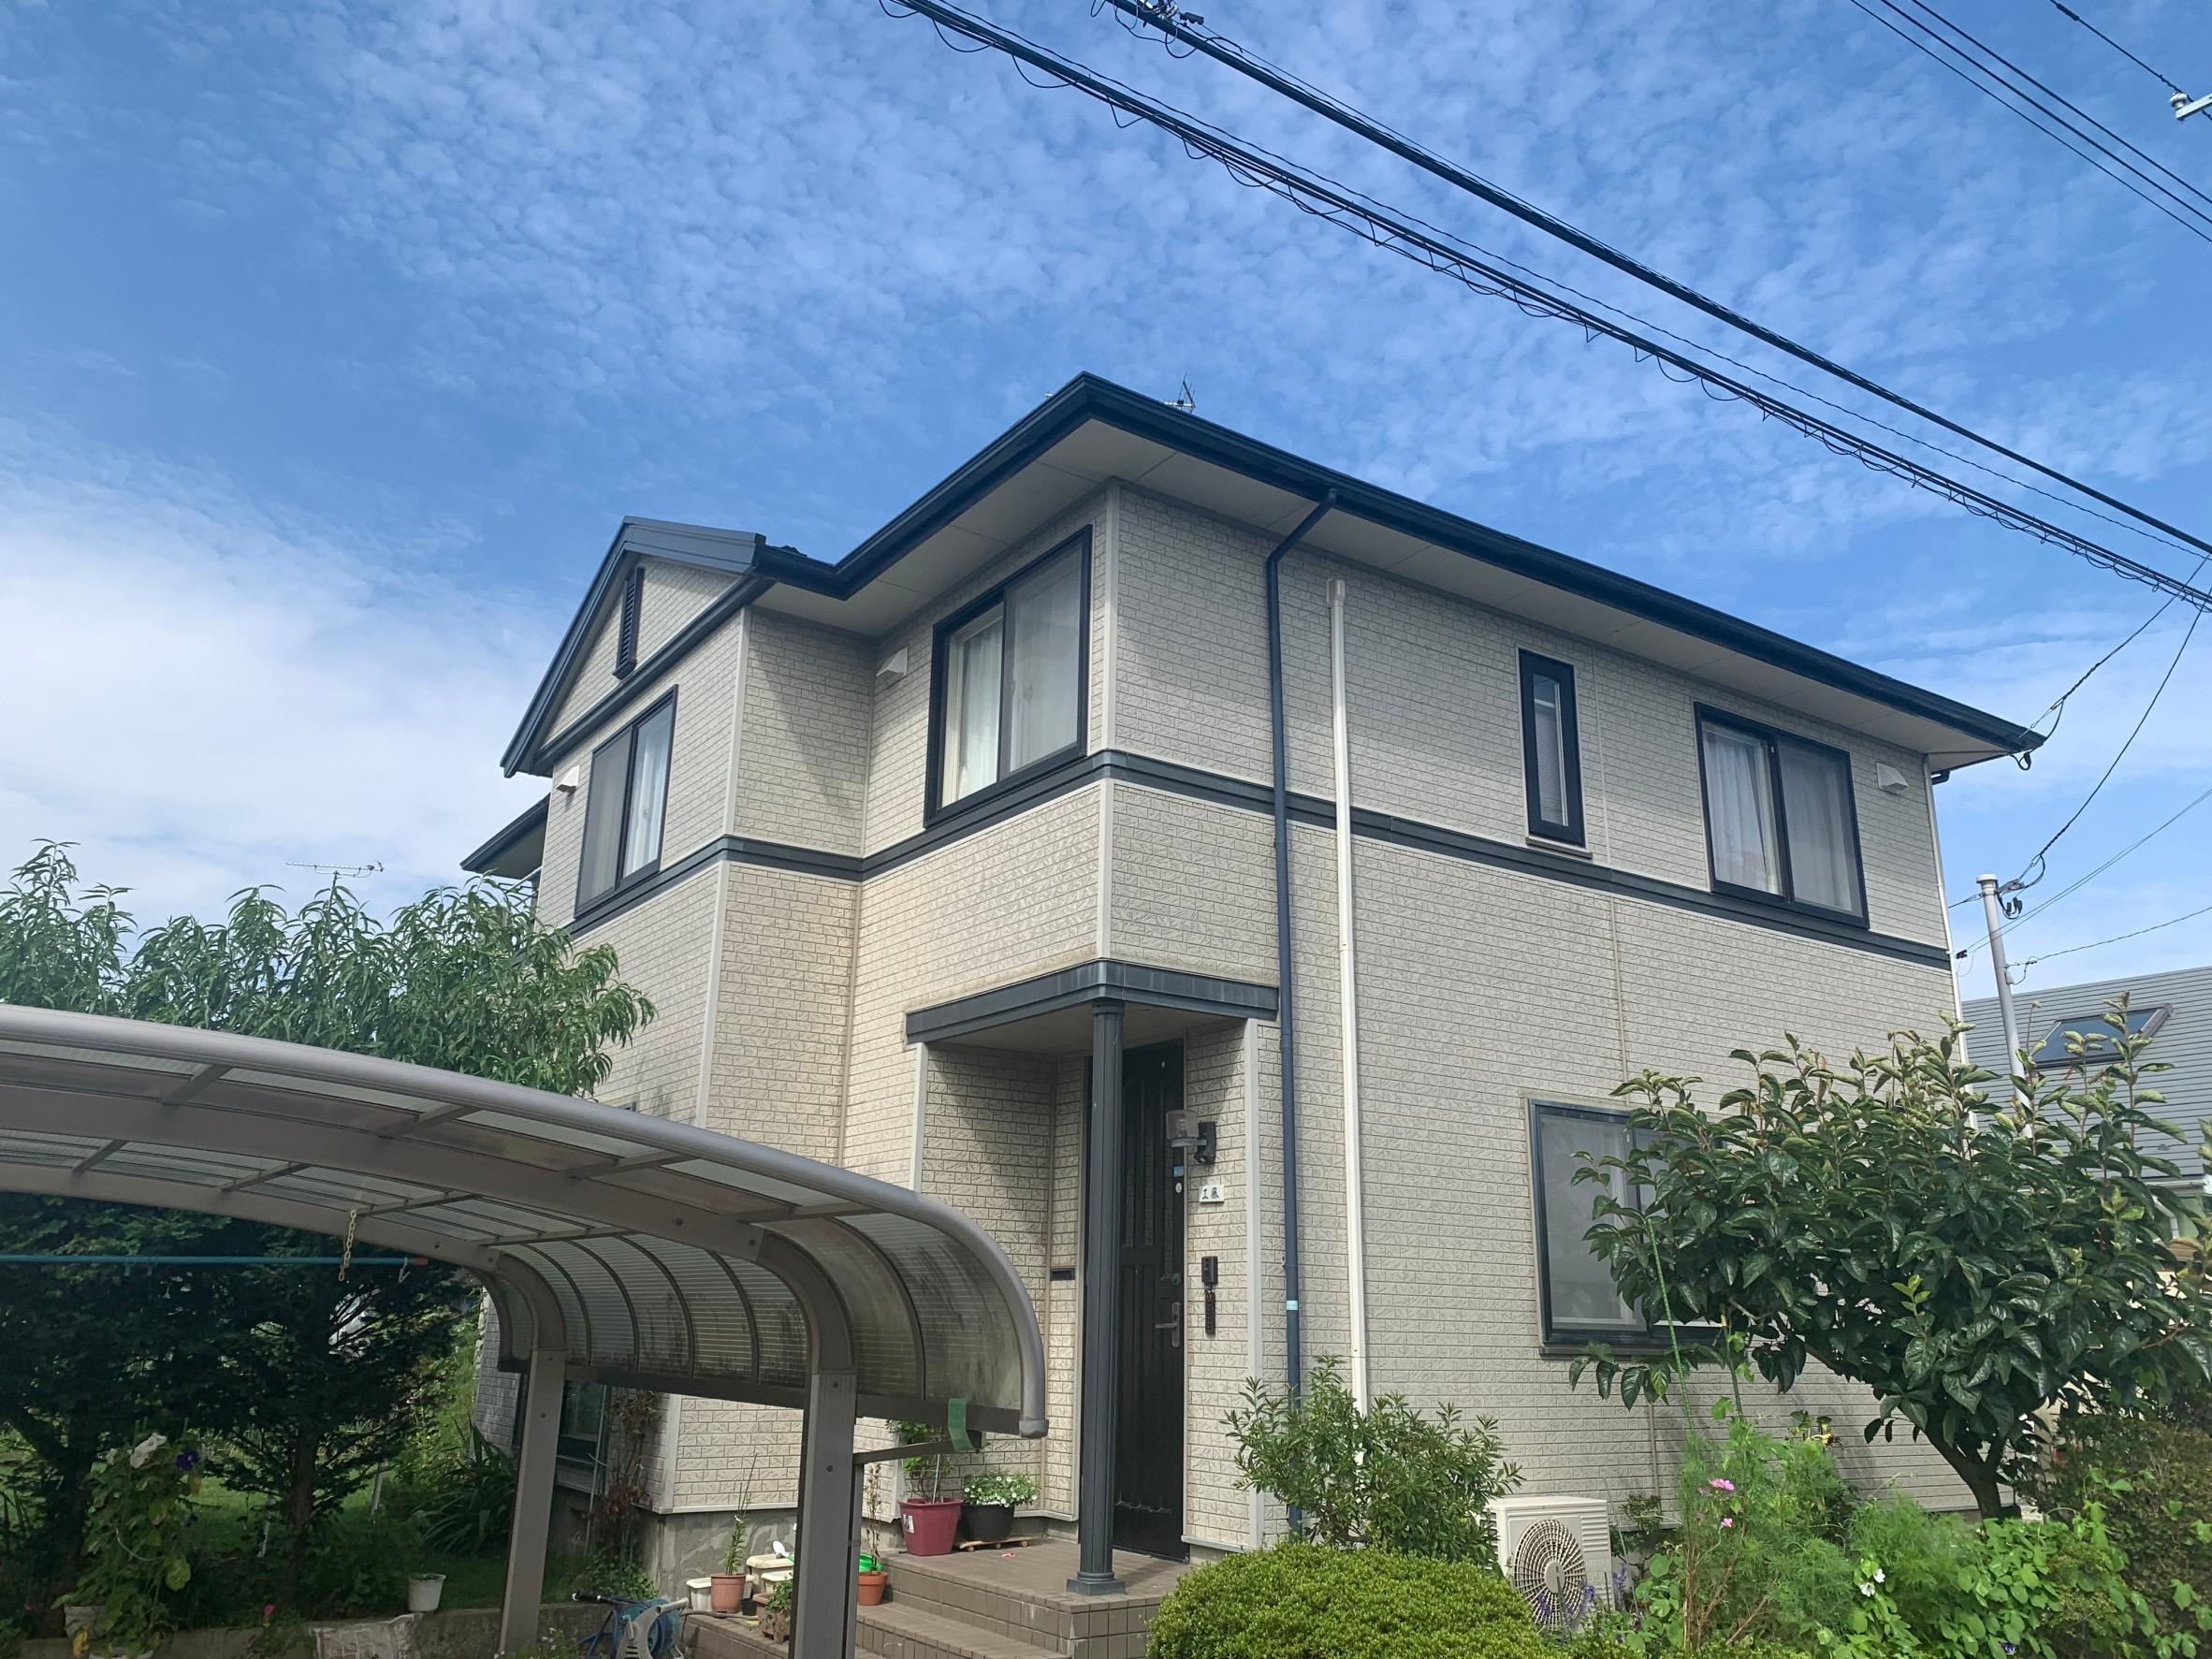 【八戸】屋根・外壁塗装が完工しました! 外壁塗装|屋根塗装|塗装業者|塗装屋|塗装会社